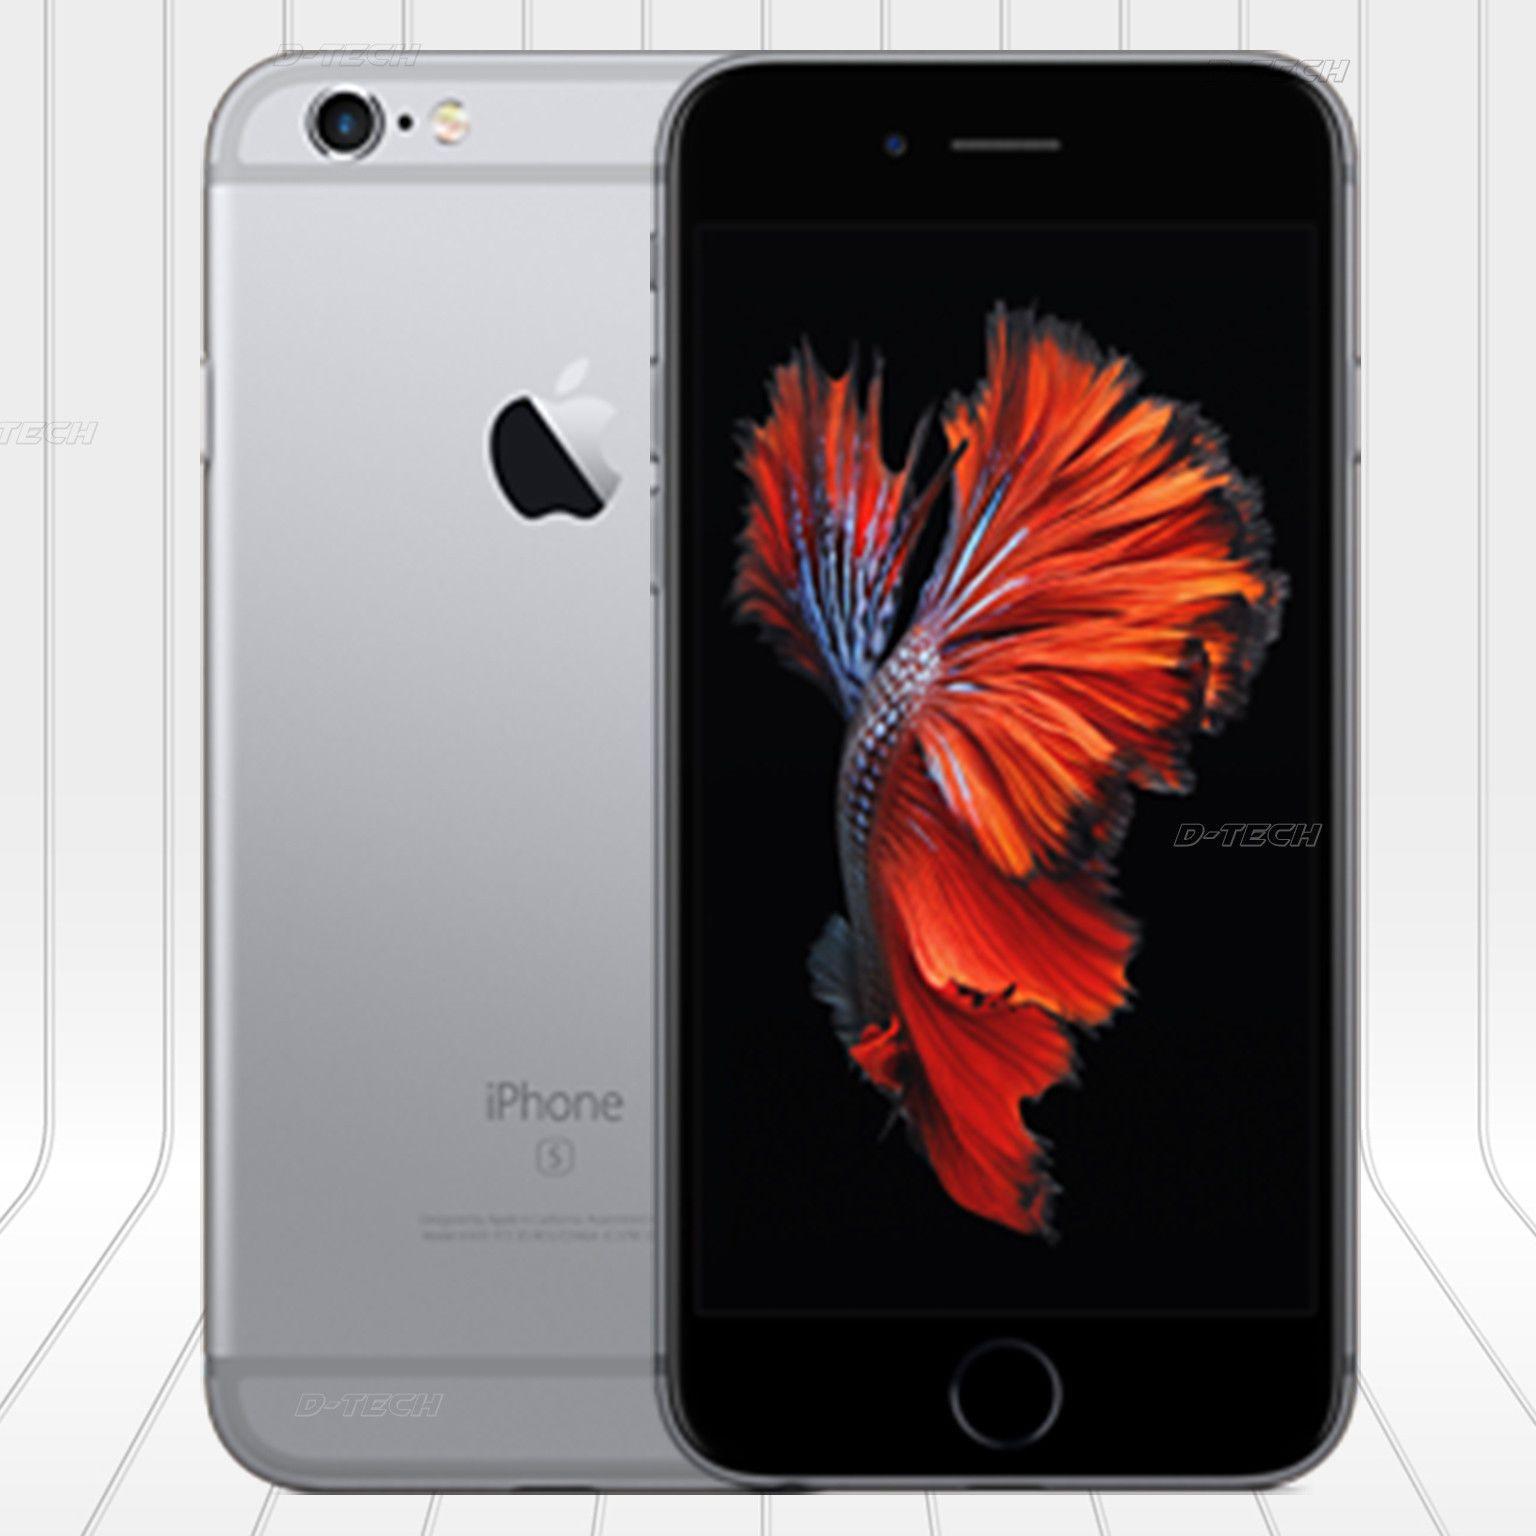 389 90 Apple Iphone 6s Plus 64gb Network Unlocked Phone 4g Lte